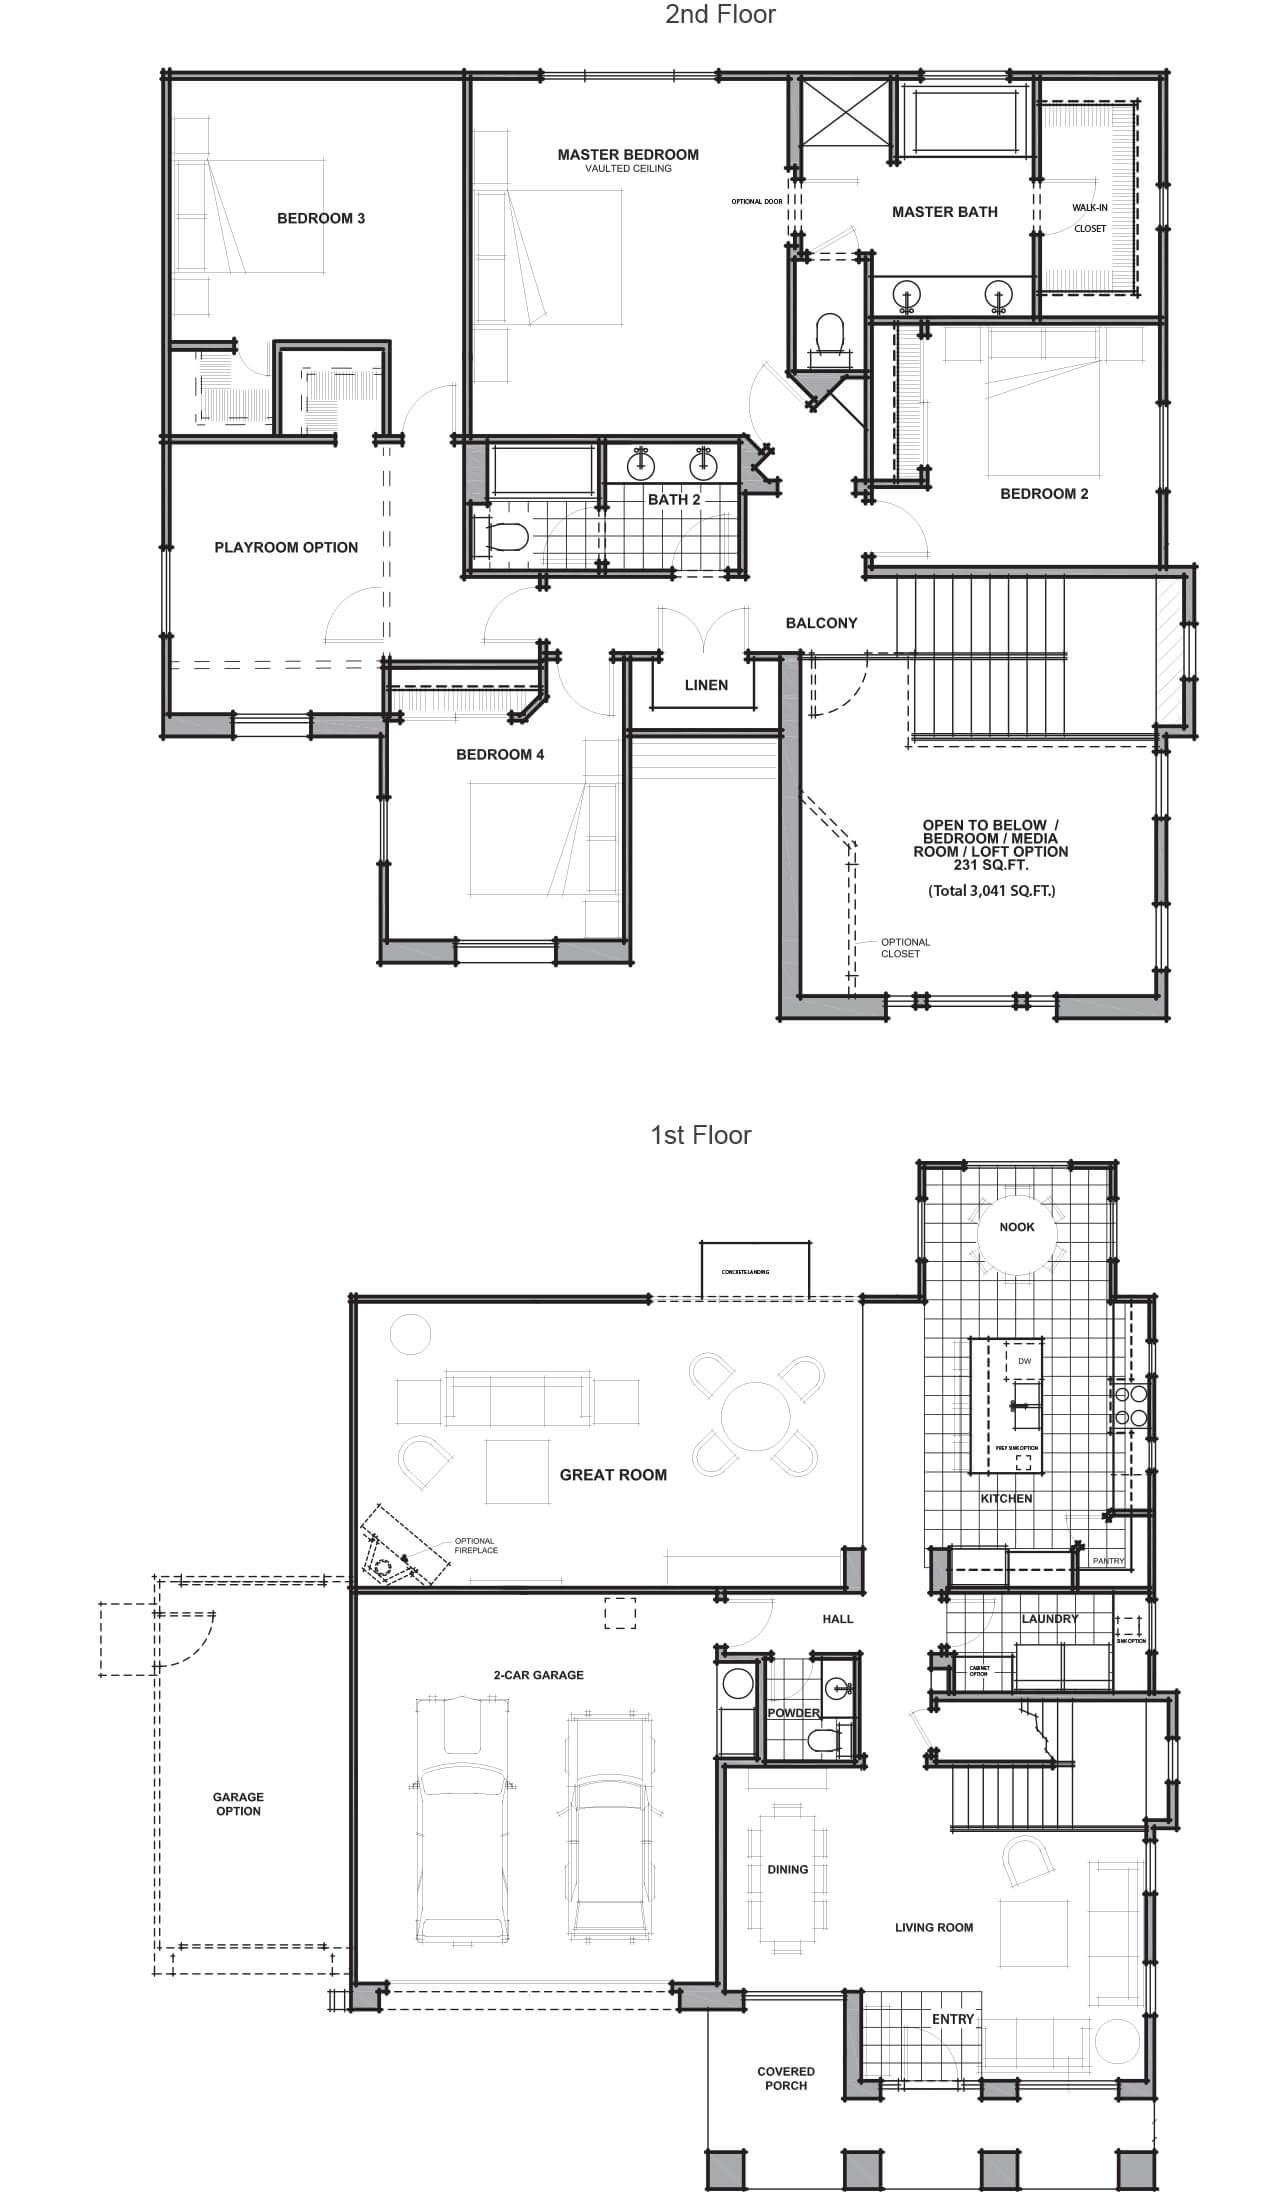 louisville floor plan - Jkb Homes Floor Plans